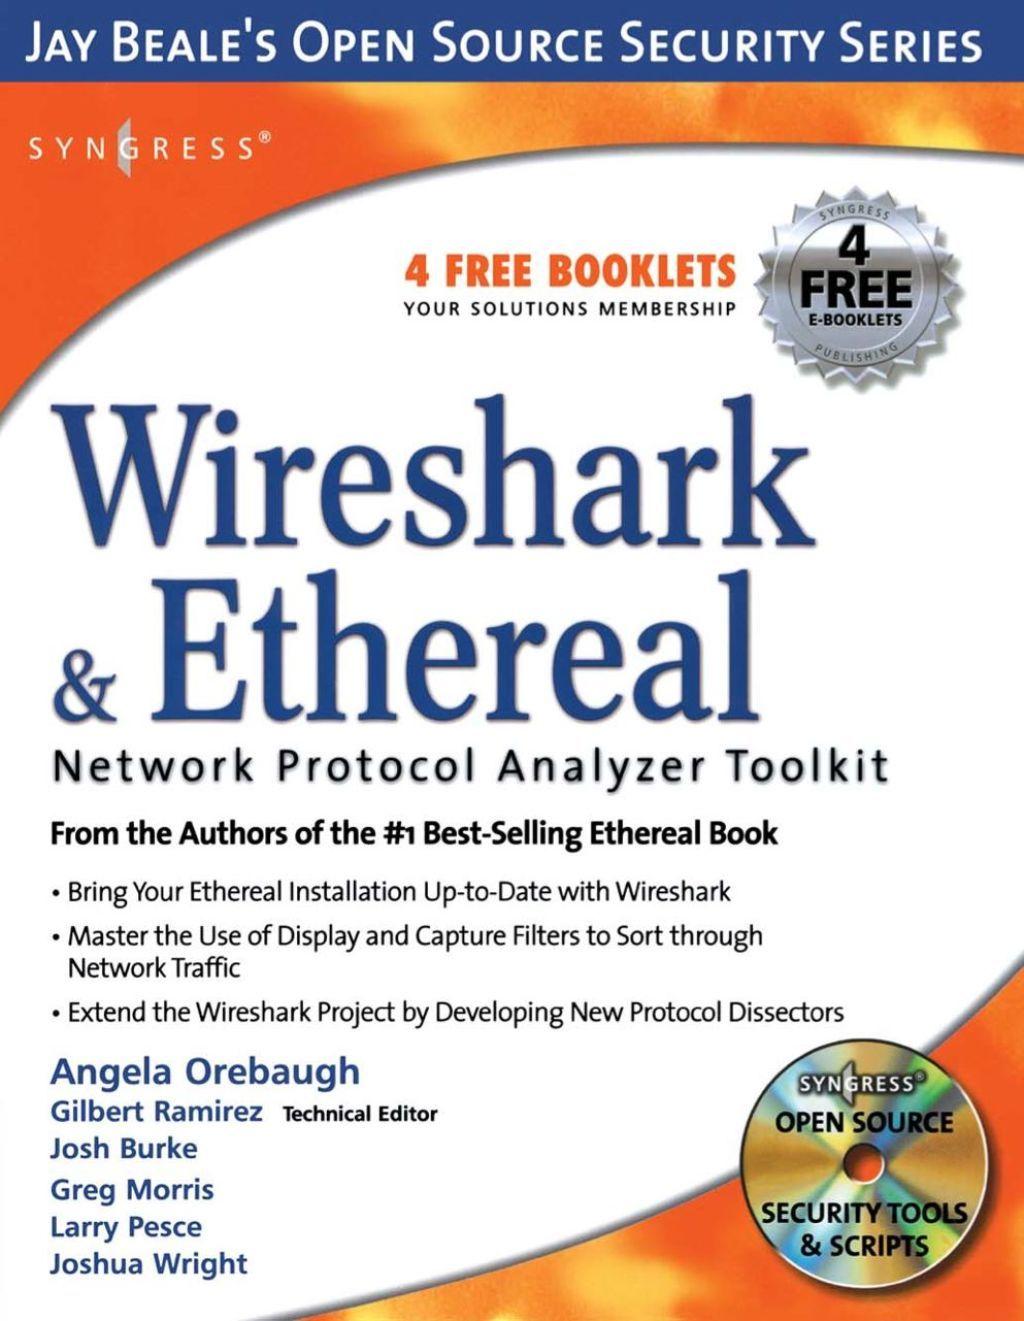 Wireshark & Ethereal Network Protocol Analyzer Toolkit